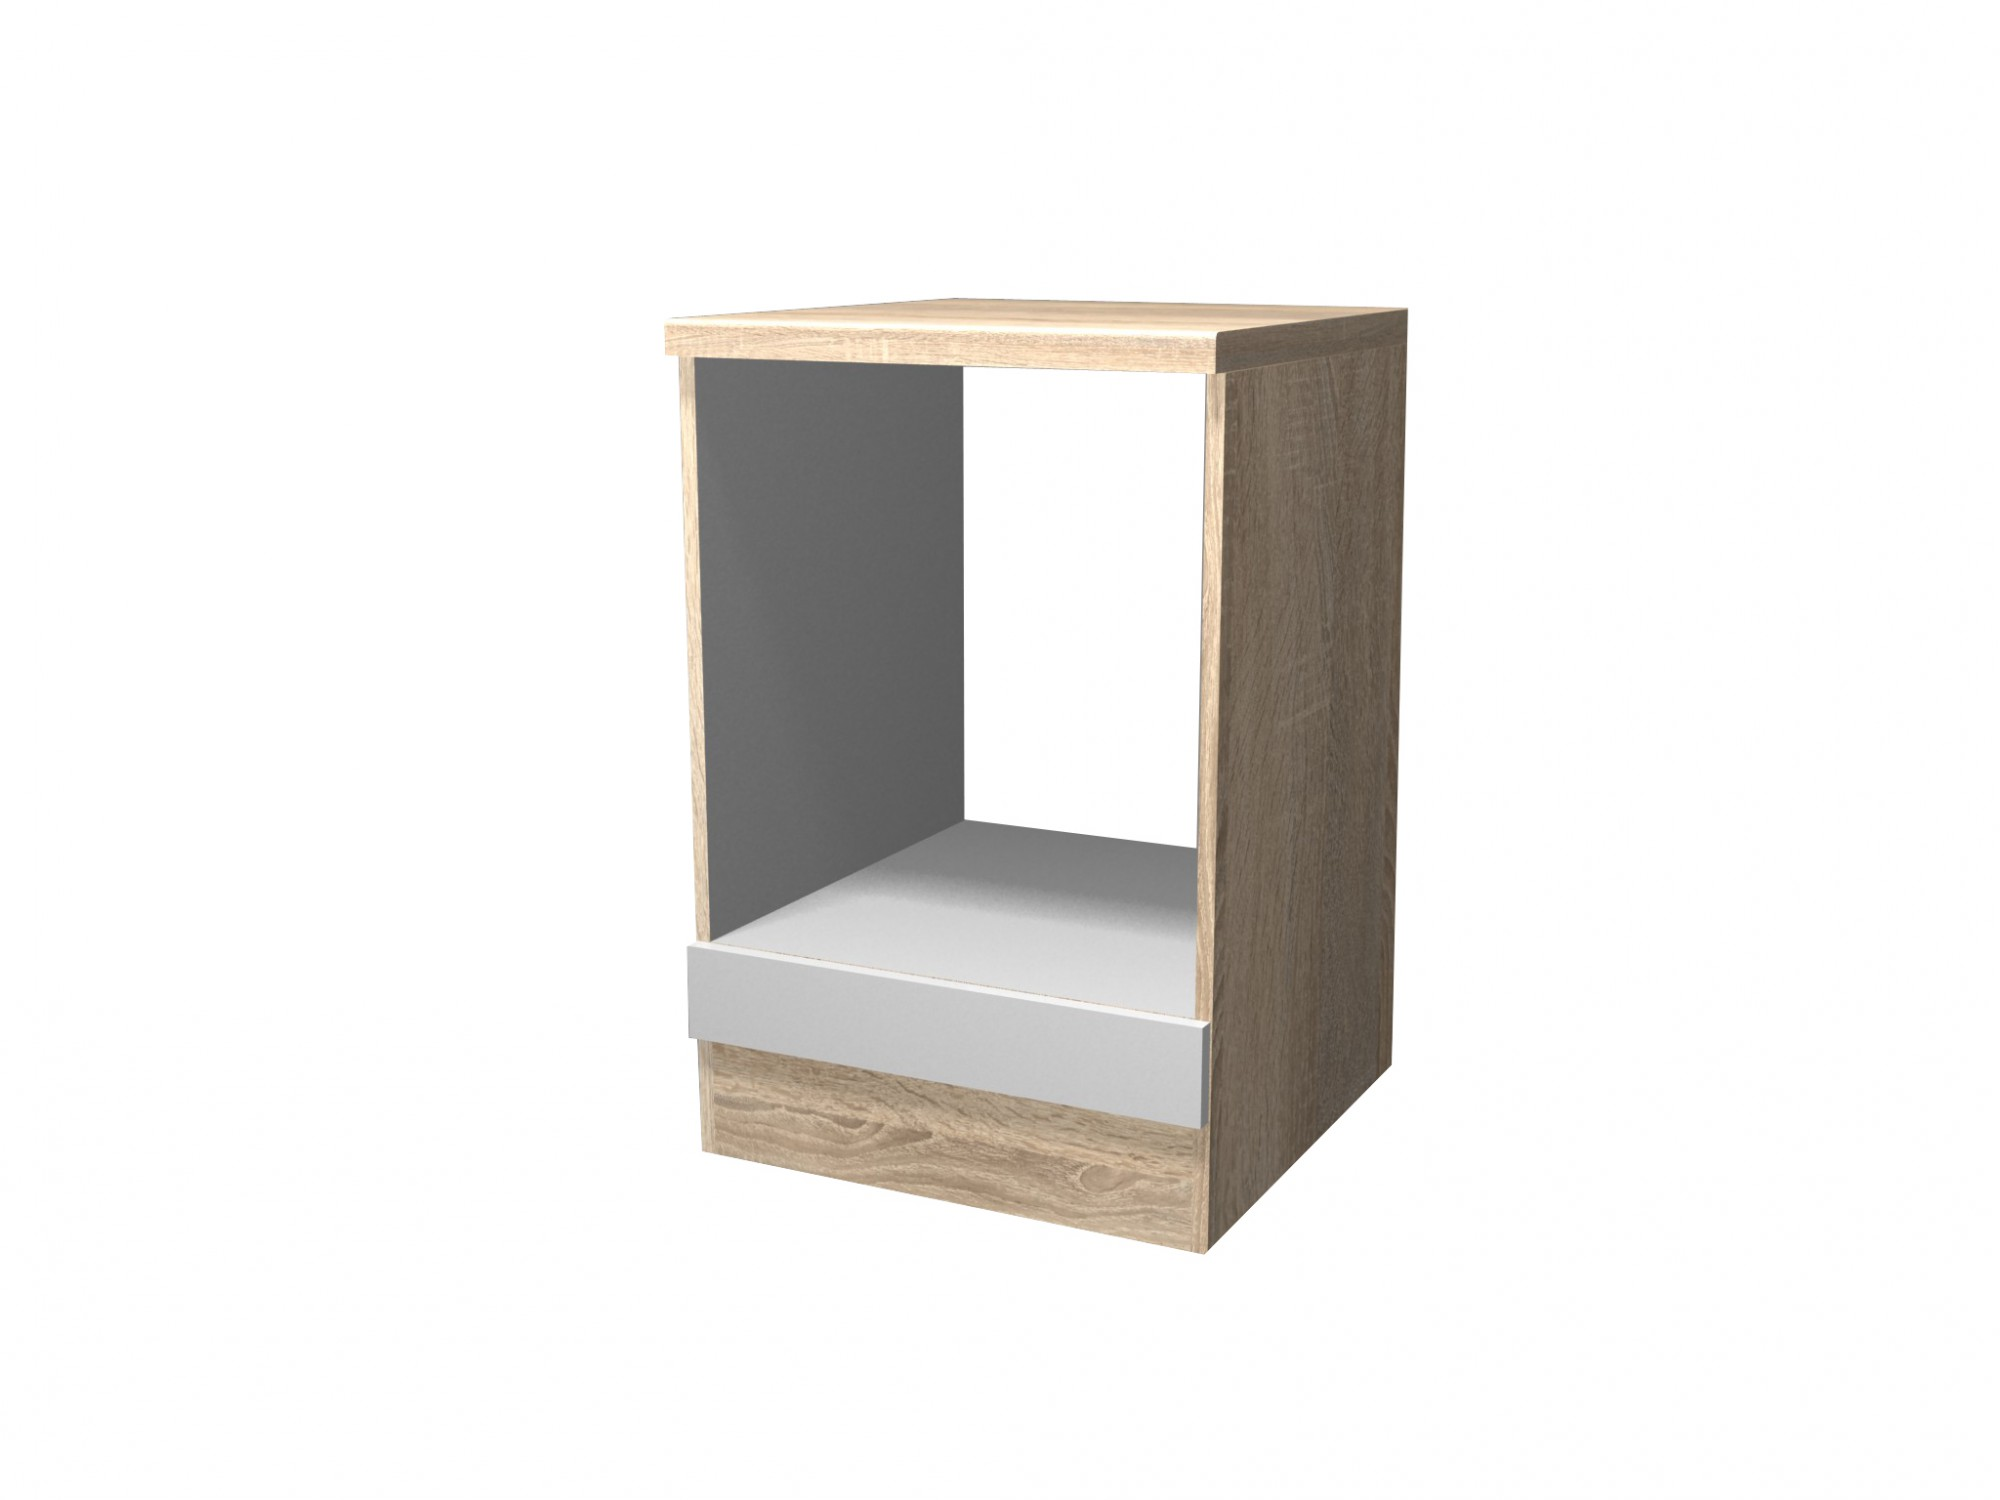 neu k chen herdumbauschrank venedig k chenschrank. Black Bedroom Furniture Sets. Home Design Ideas